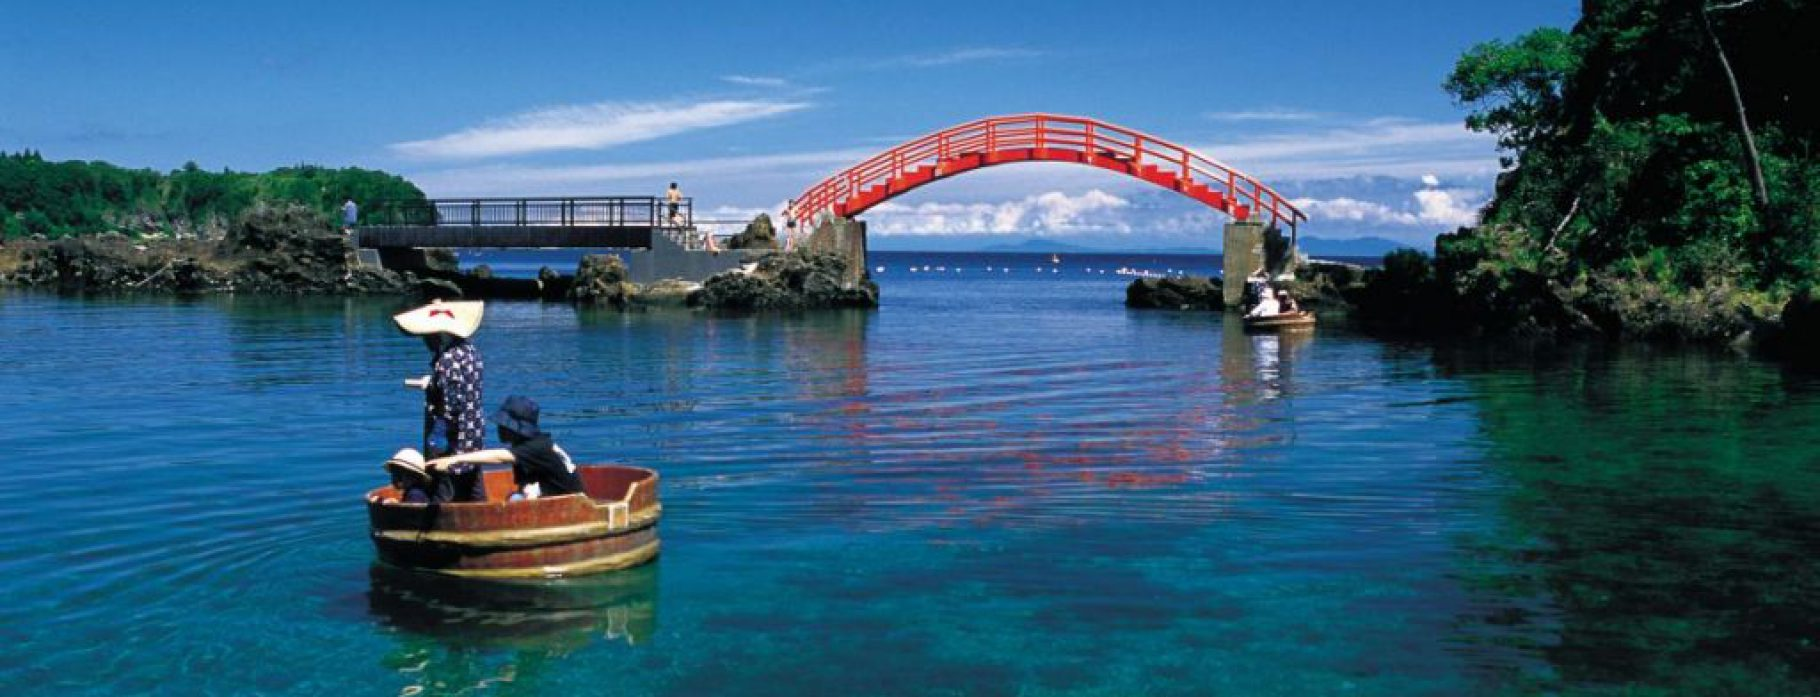 8 DAYS DISCOVER THE TREASURES OF SADO ISLAND & NIIGATA